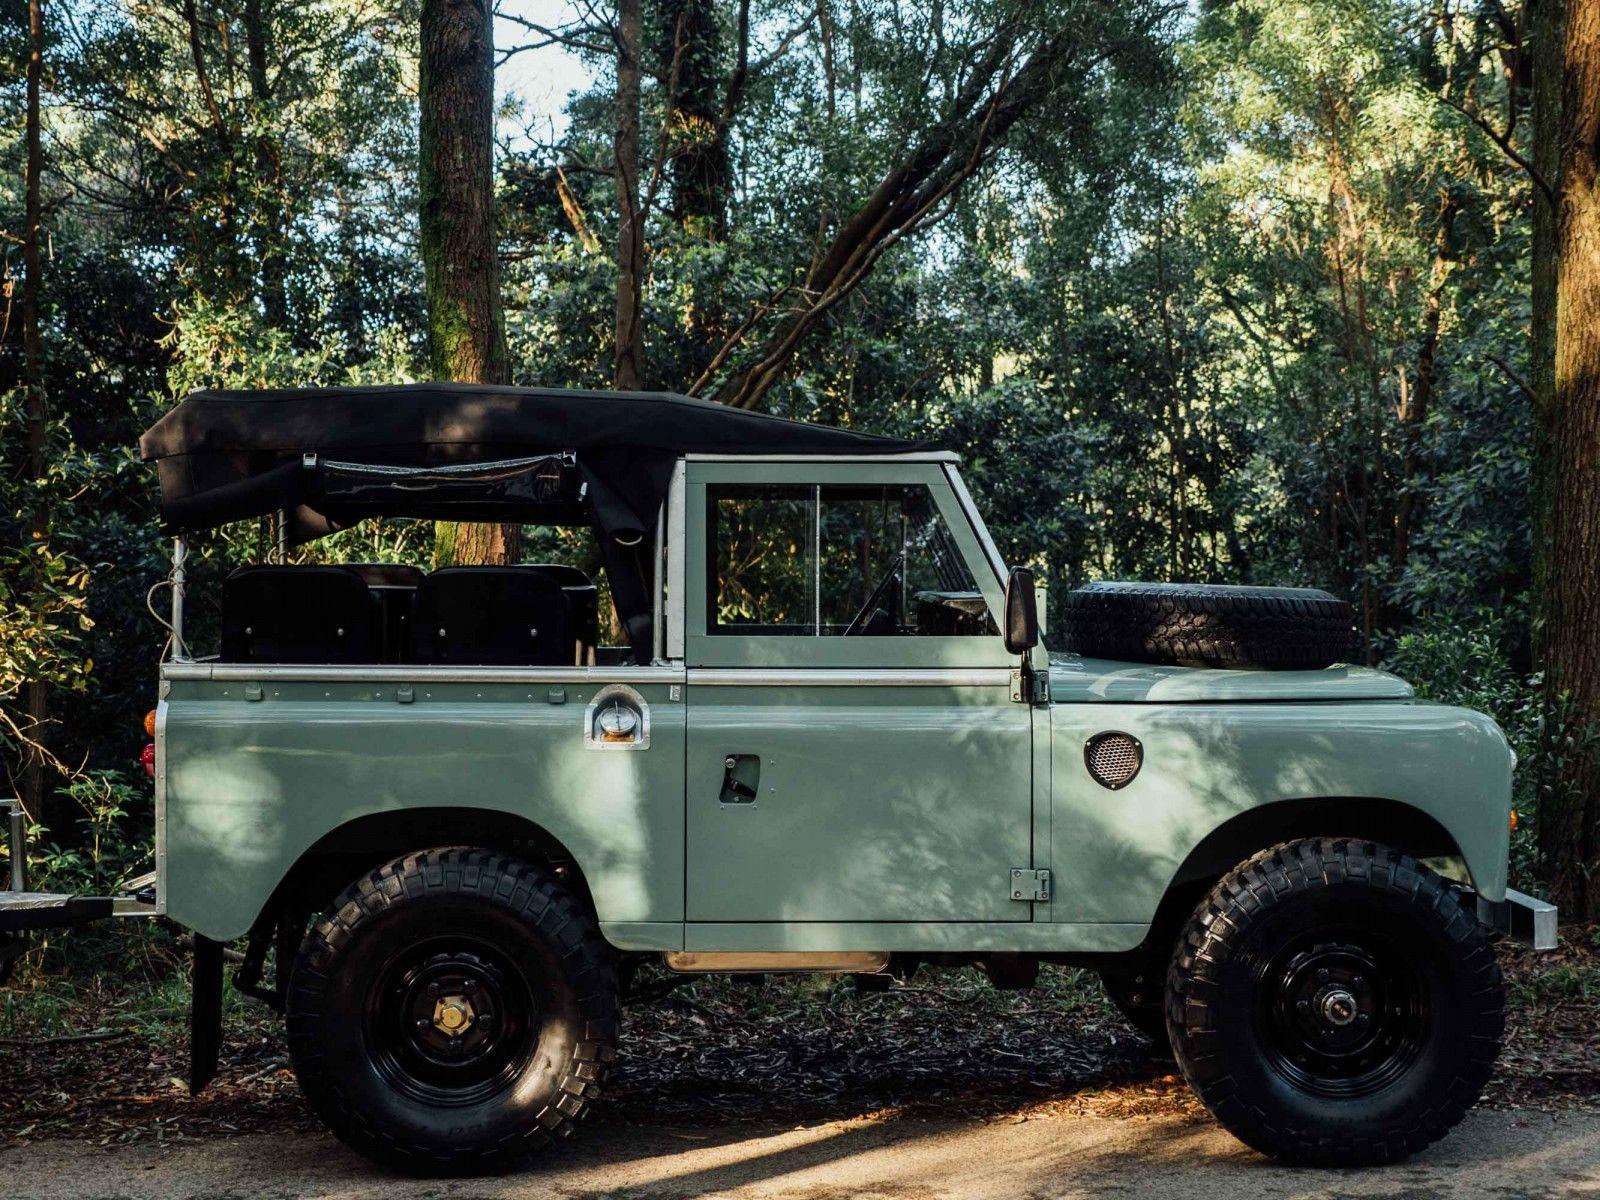 Best 25 Land rover series 3 ideas on Pinterest